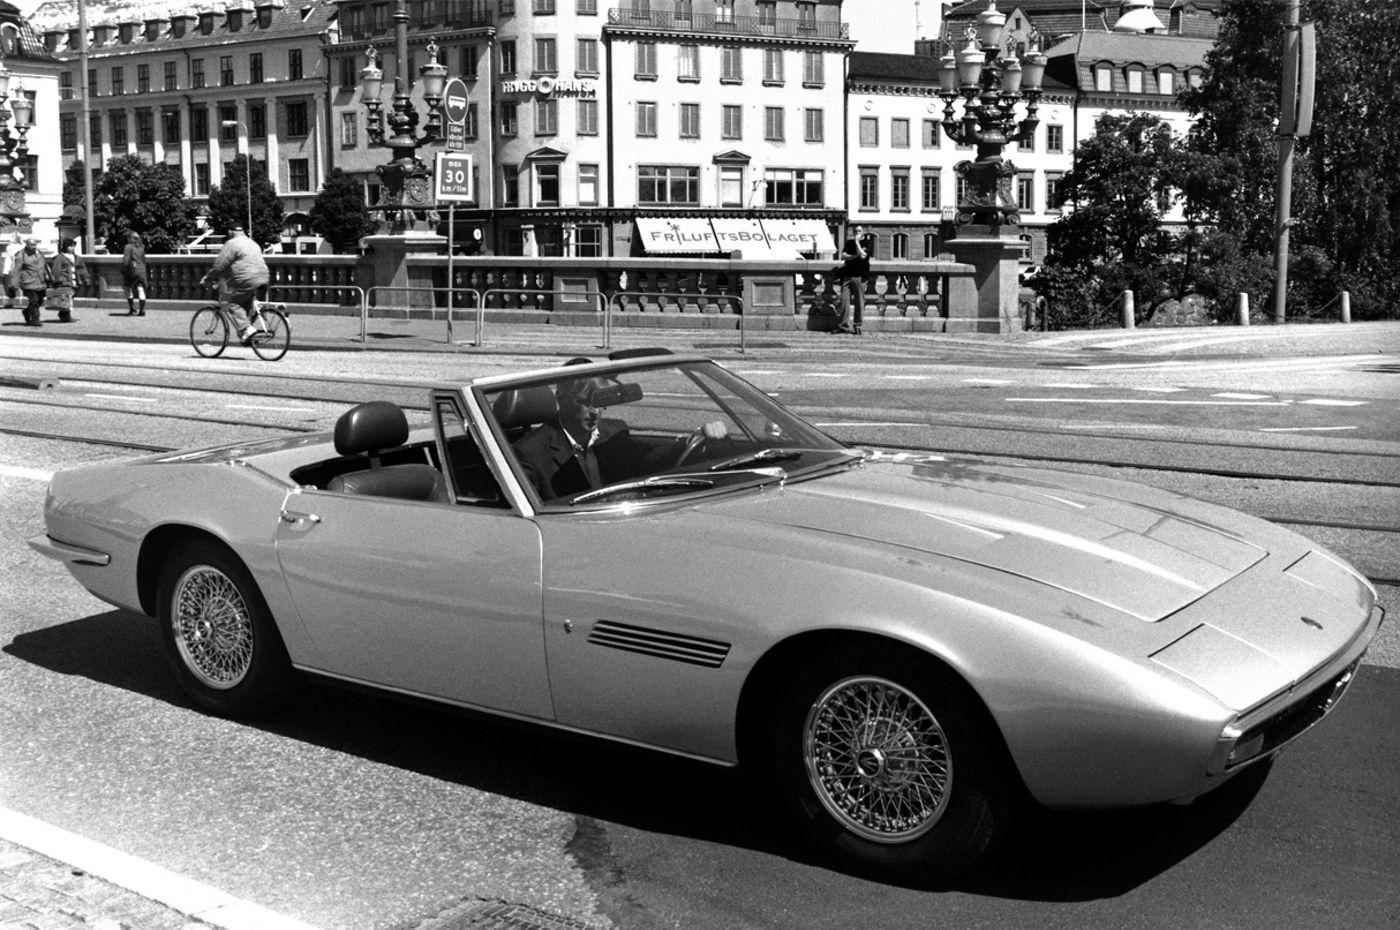 Maserati Classic - GranTurismo Ghibli Spyder - vue latérale